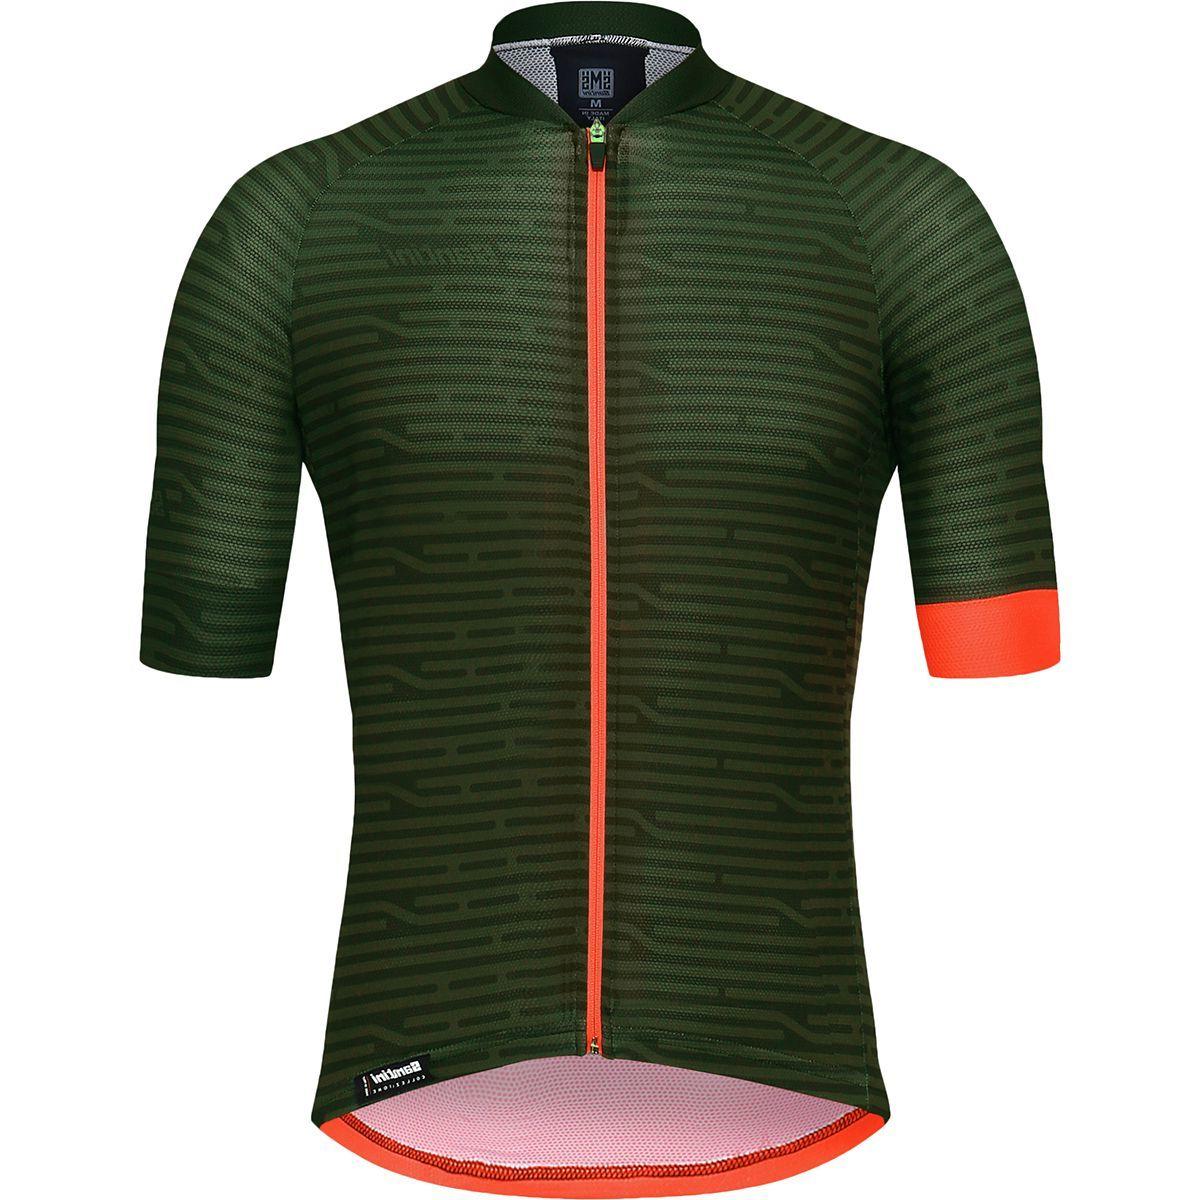 Santini Soffio Short-Sleeve Jersey - Men's